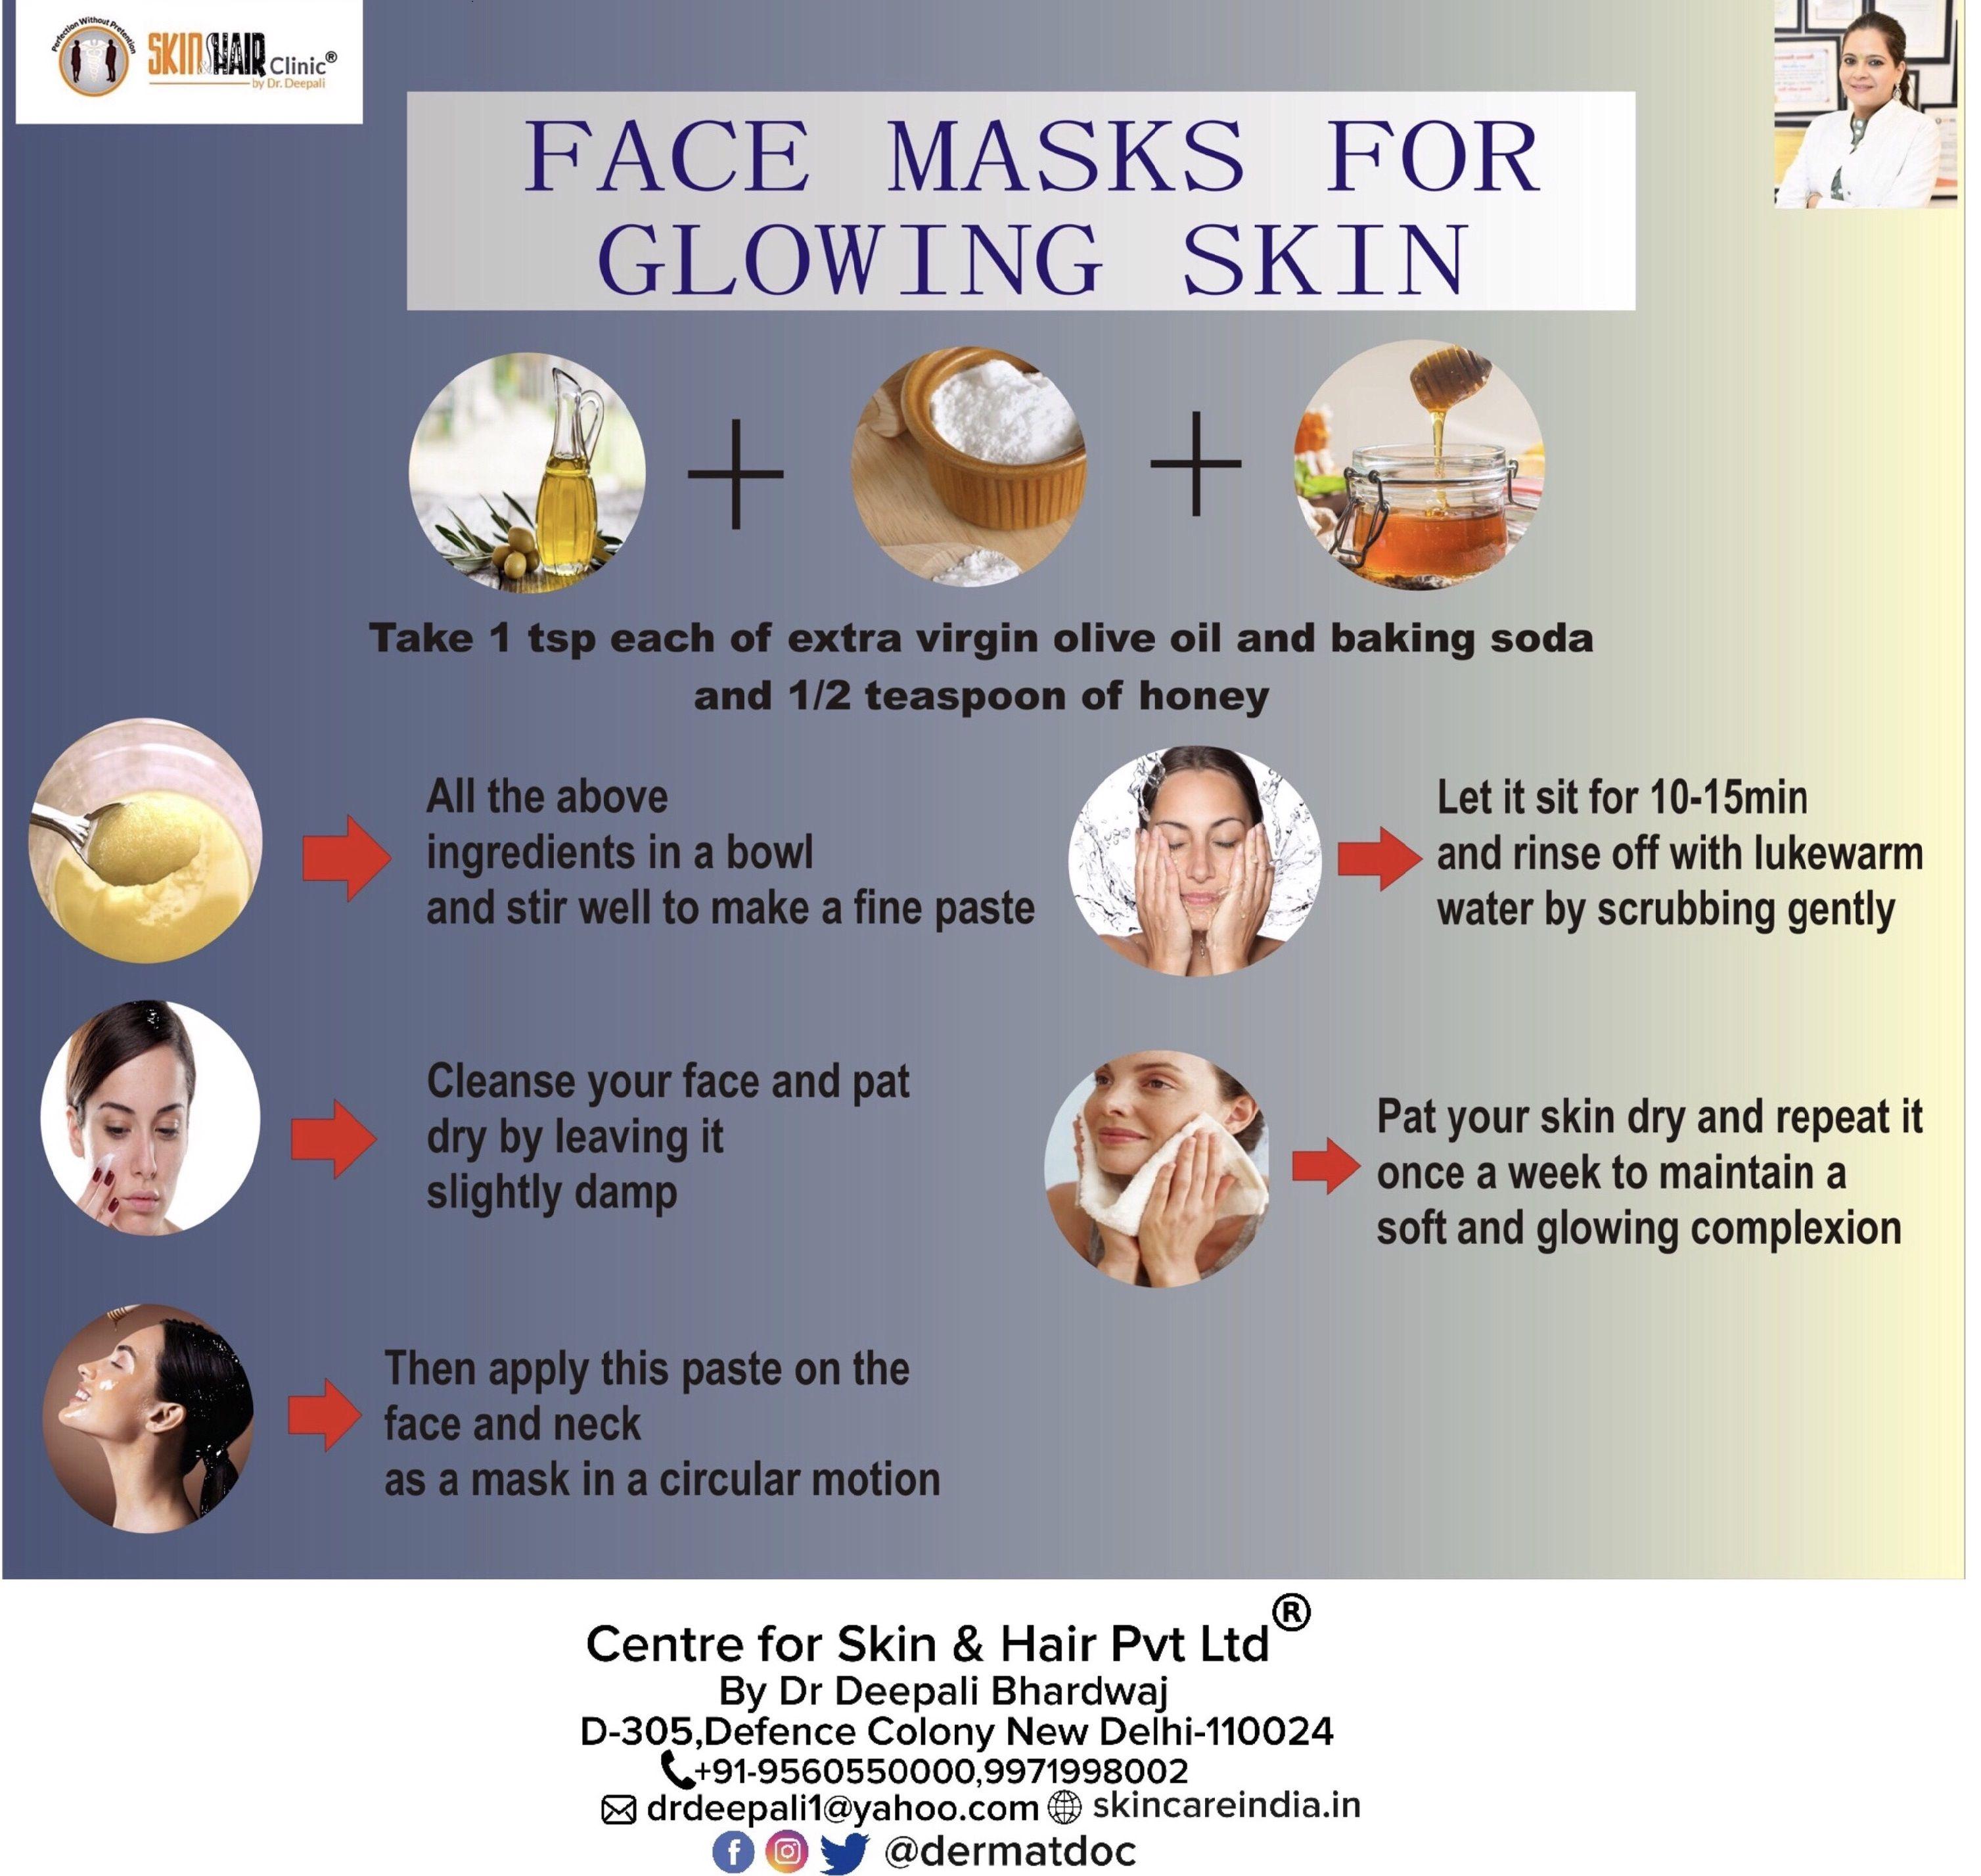 healthcare skincare dermatologist drdeepalibhardwaj